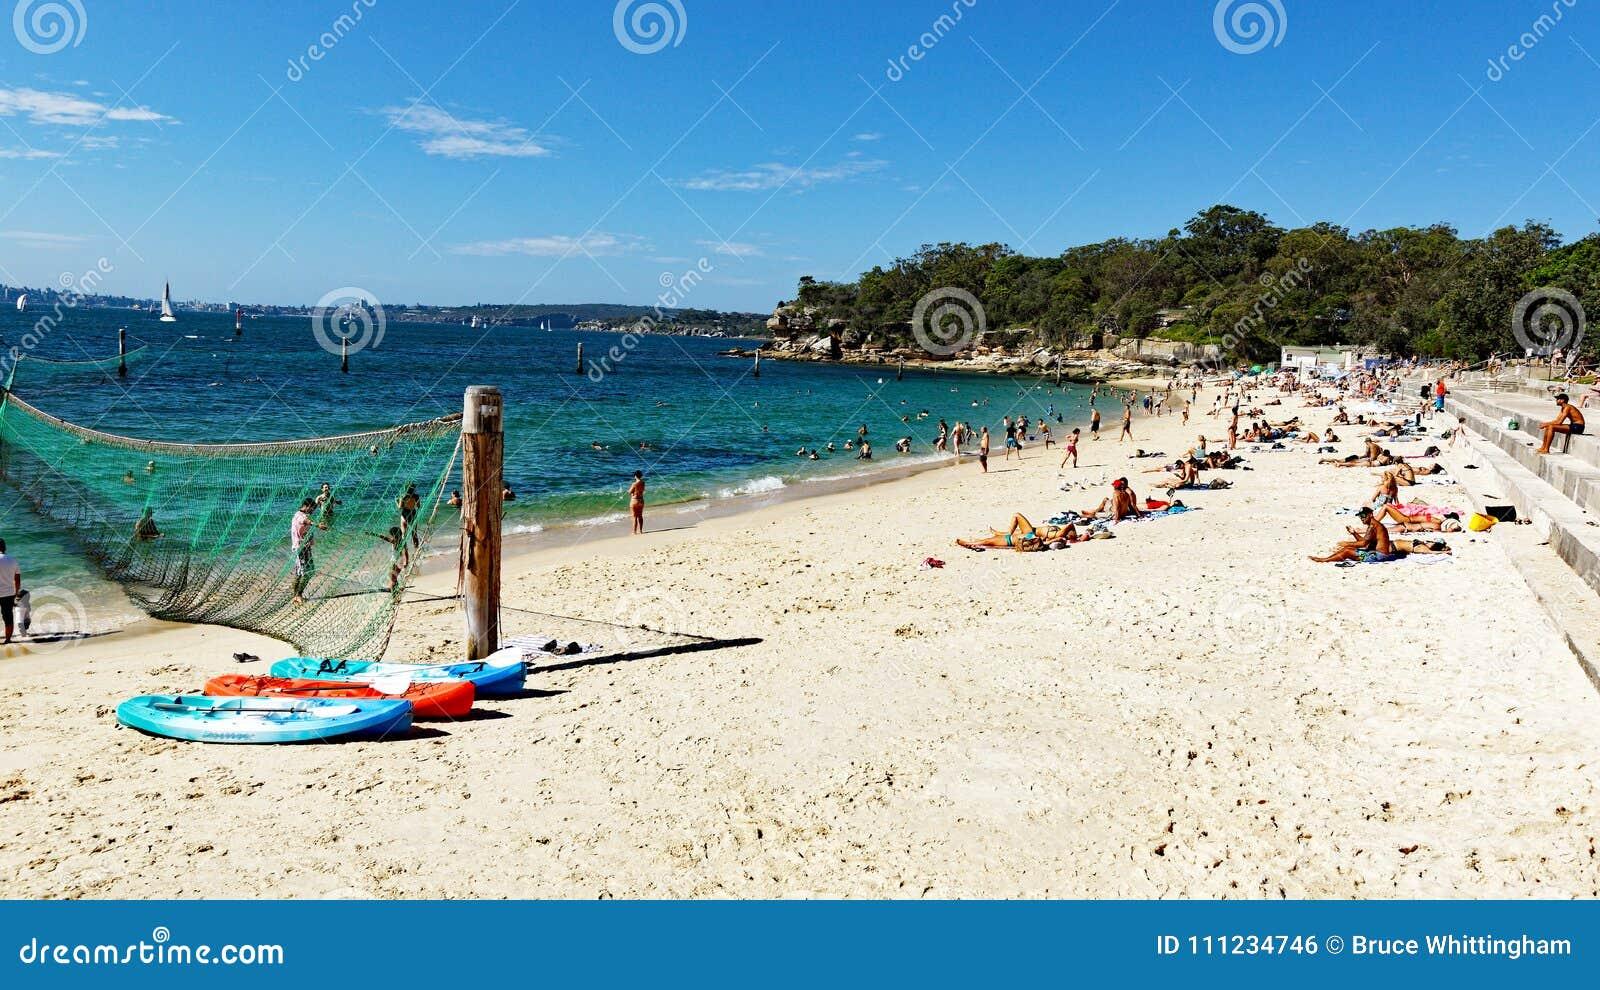 Haifisch-Strand, Nielsen Park, Vaucluse, Sydney, Australien